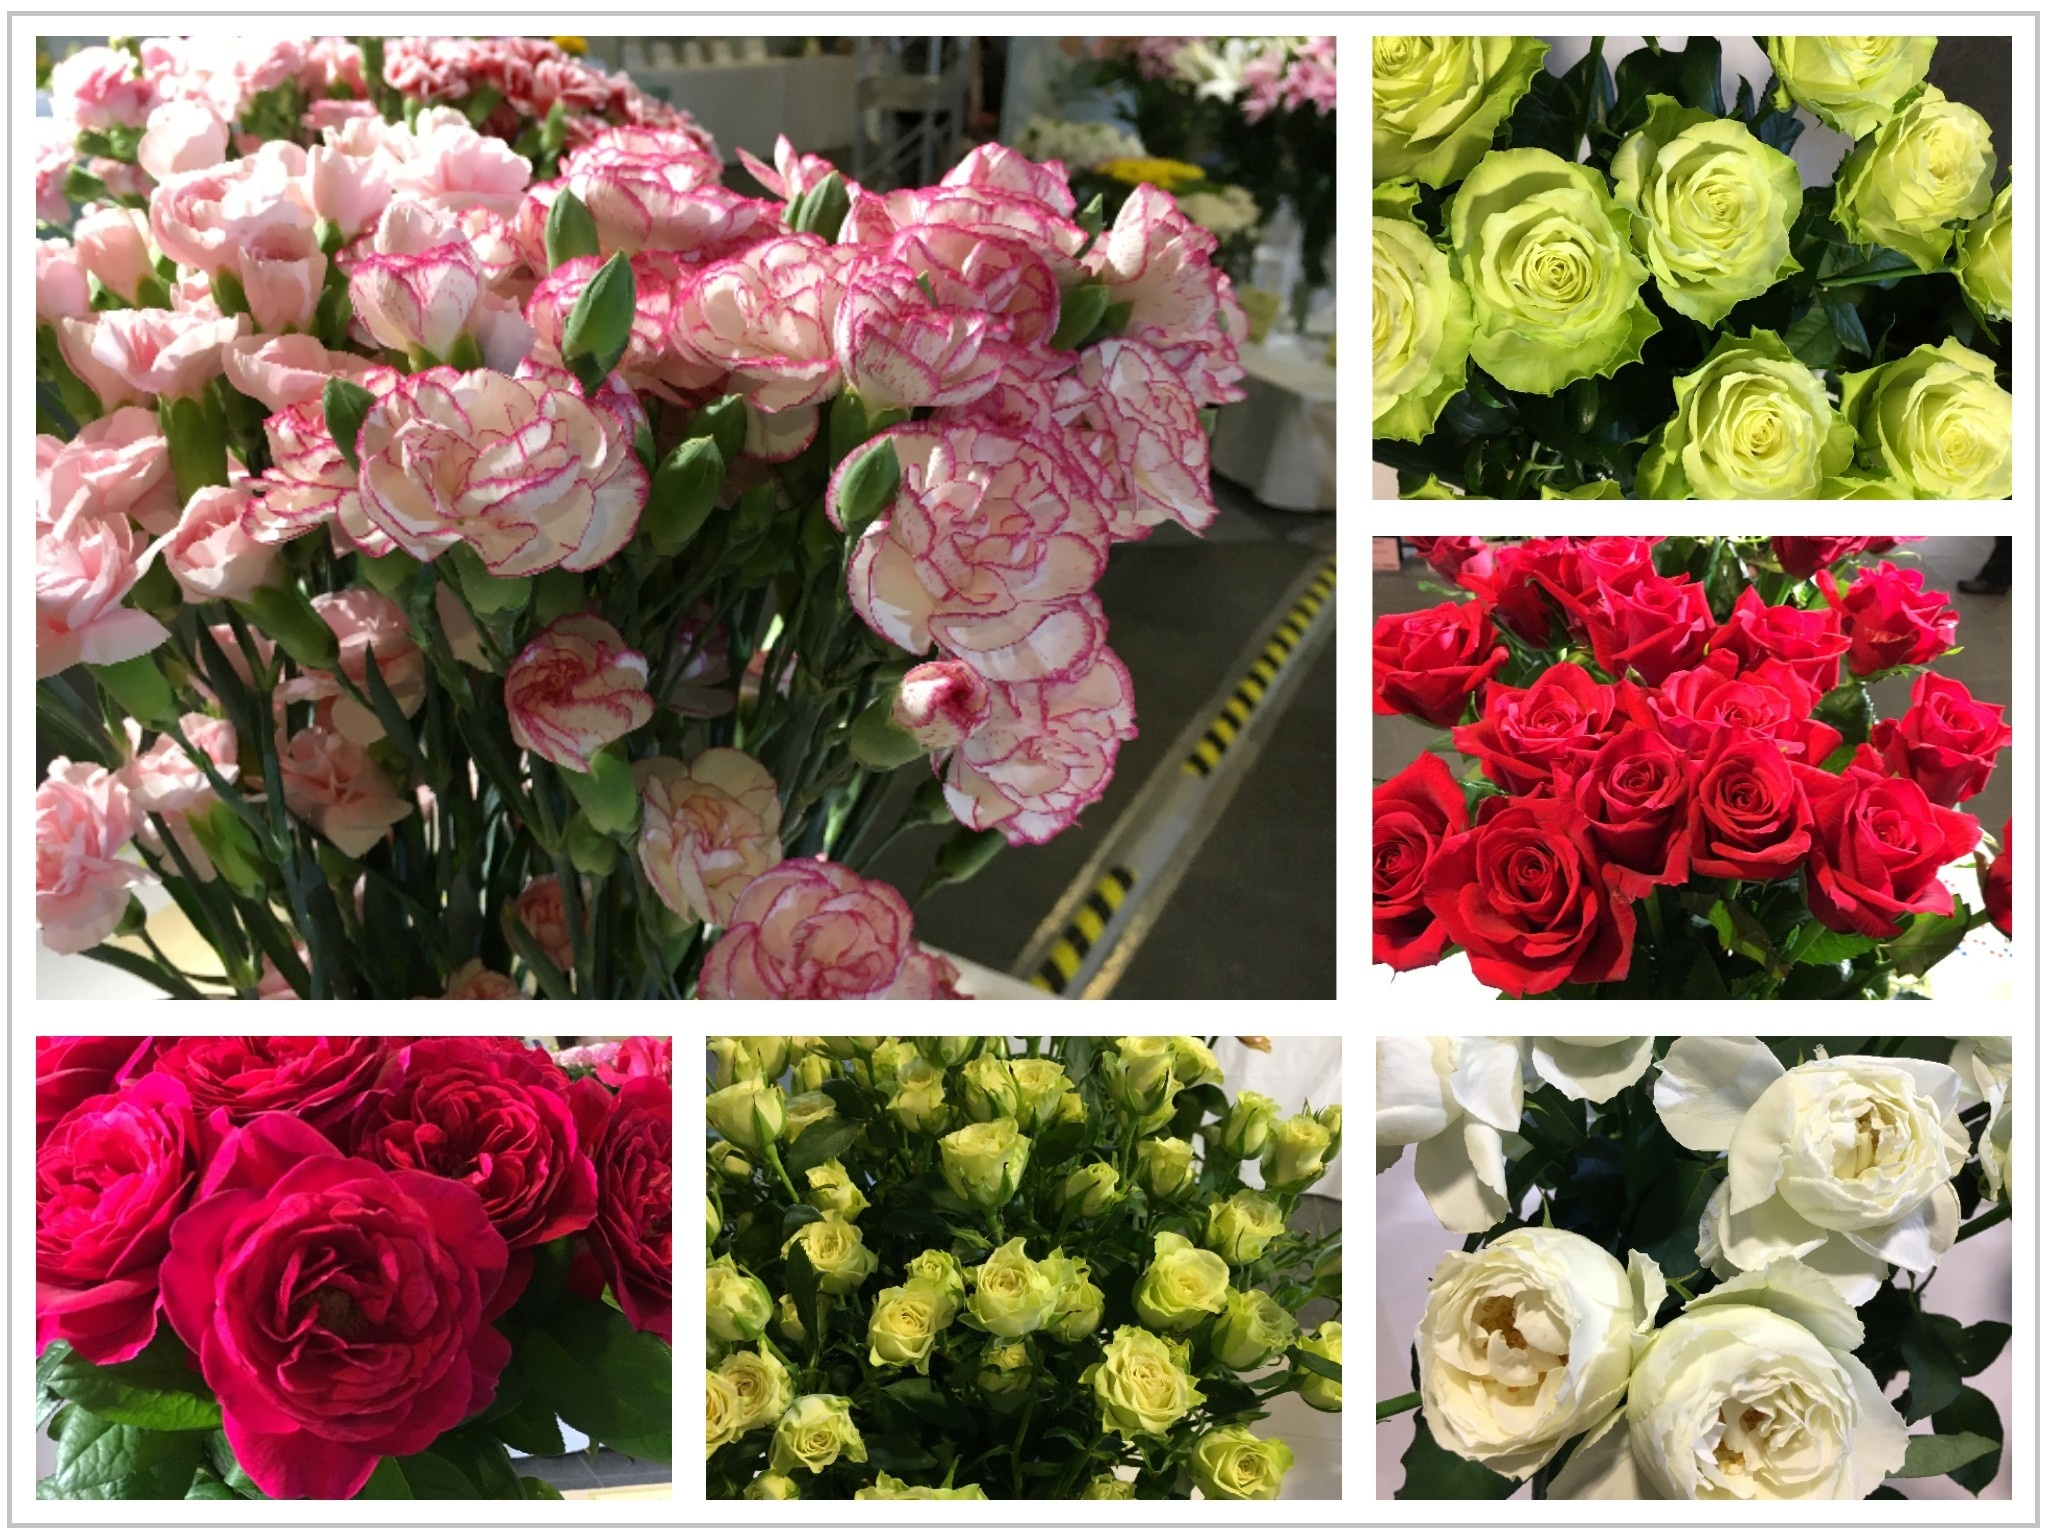 rose_1_830.jpg